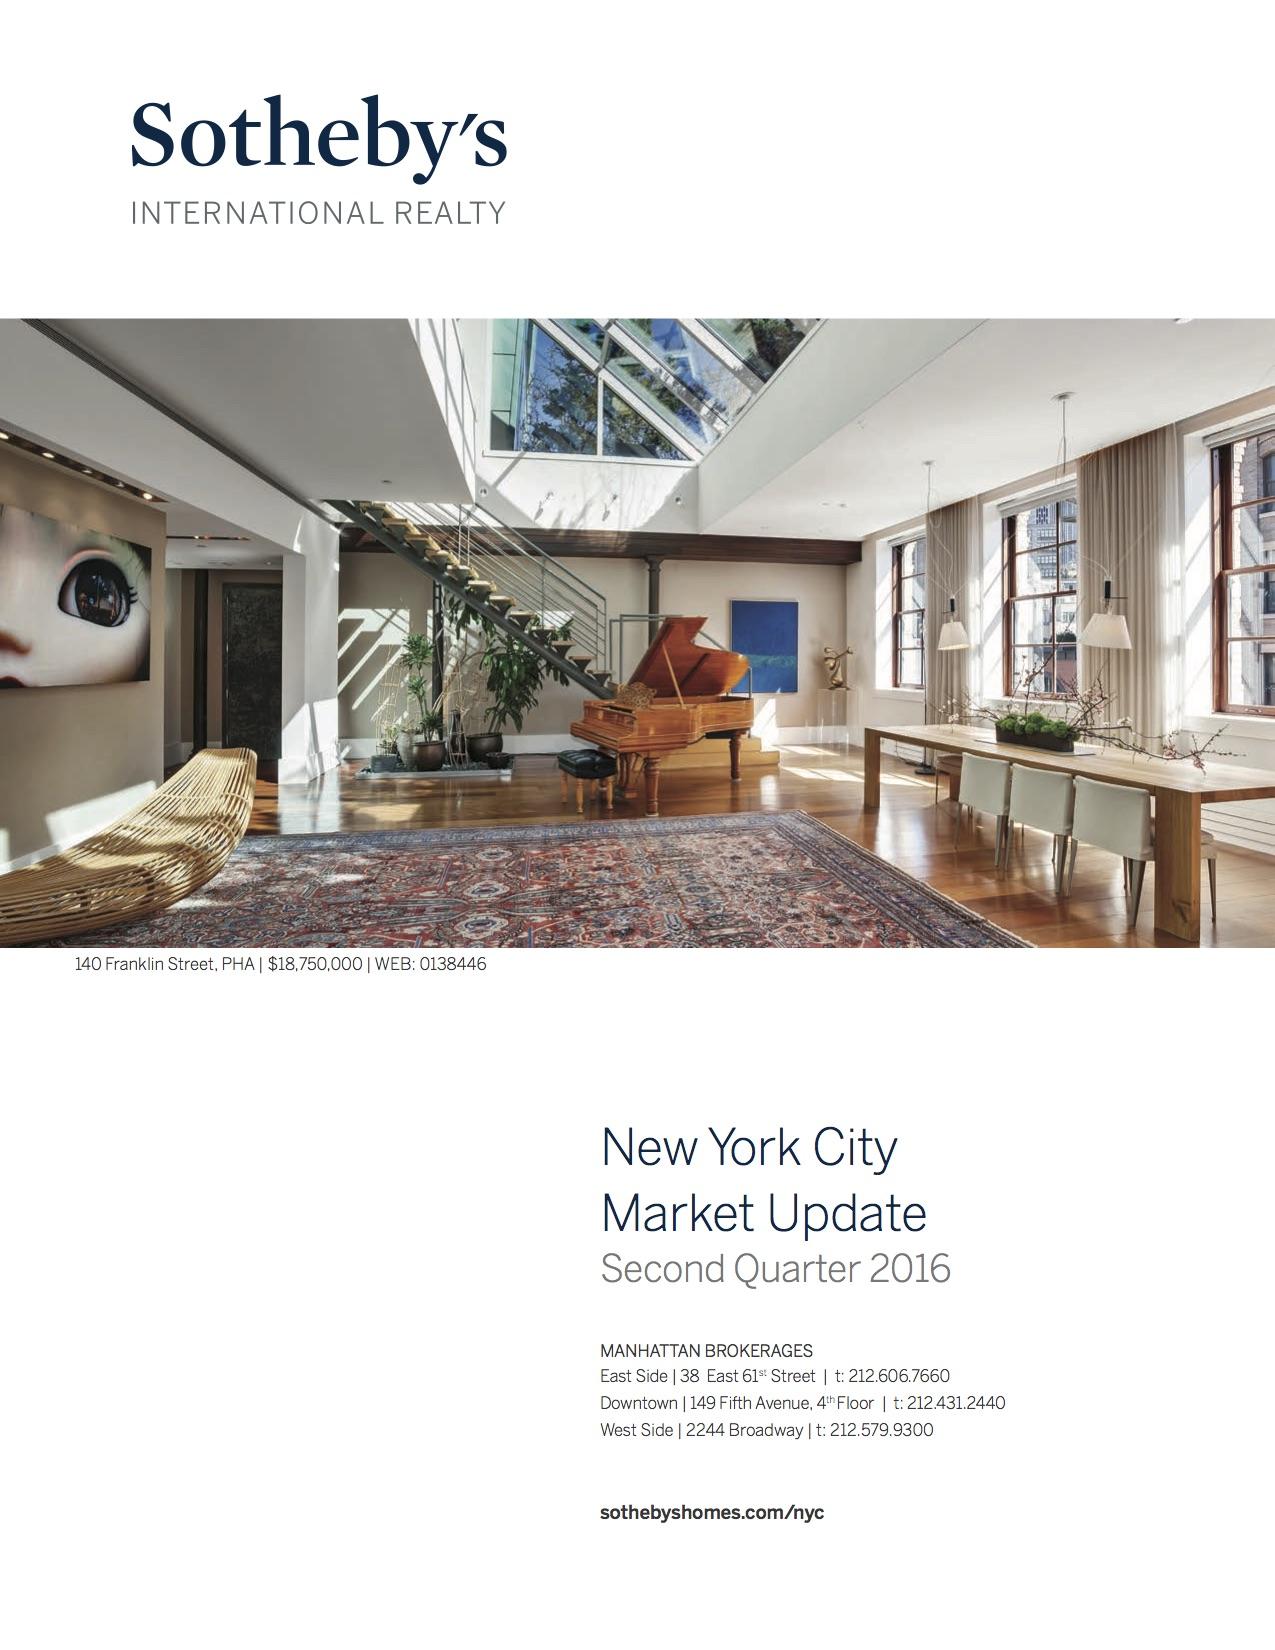 SothebysInternationalRealty_Manhattan_MarketReport_2016_Q2_1.jpg